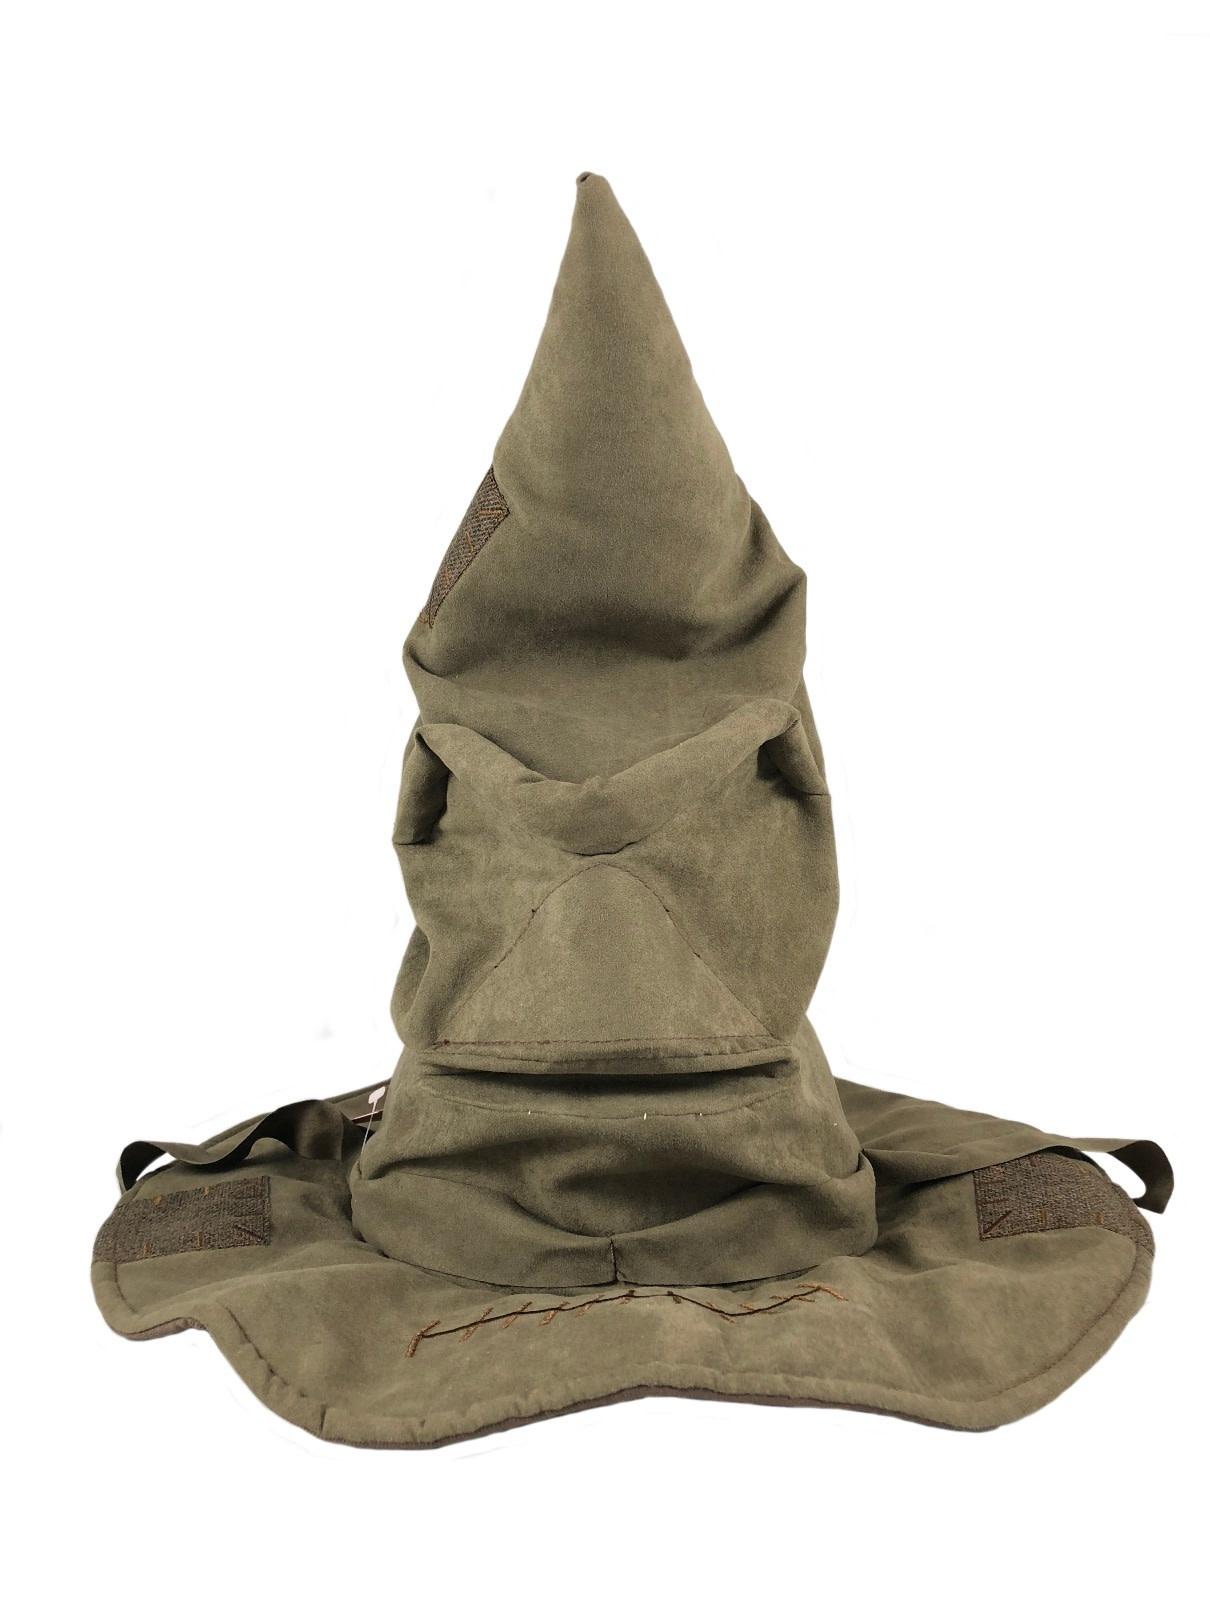 MAXX MARKETING Harry Potter: Sorting Hat in Window Box (English)